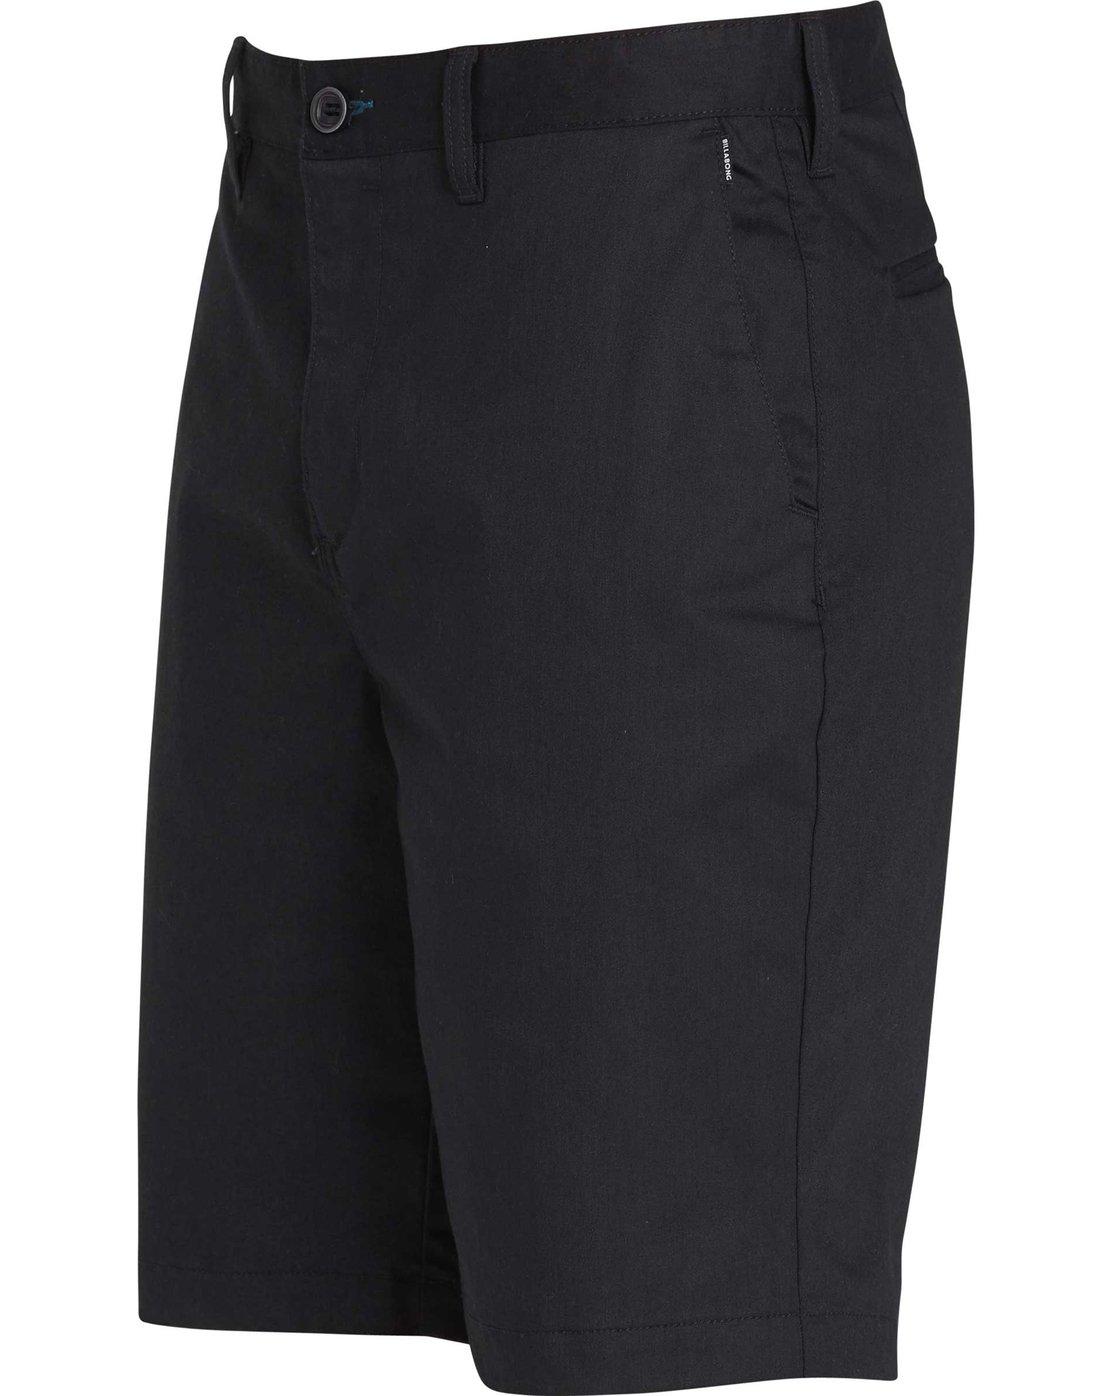 2bb3456f6a 1 Carter Stretch Shorts Black M231NBCS Billabong